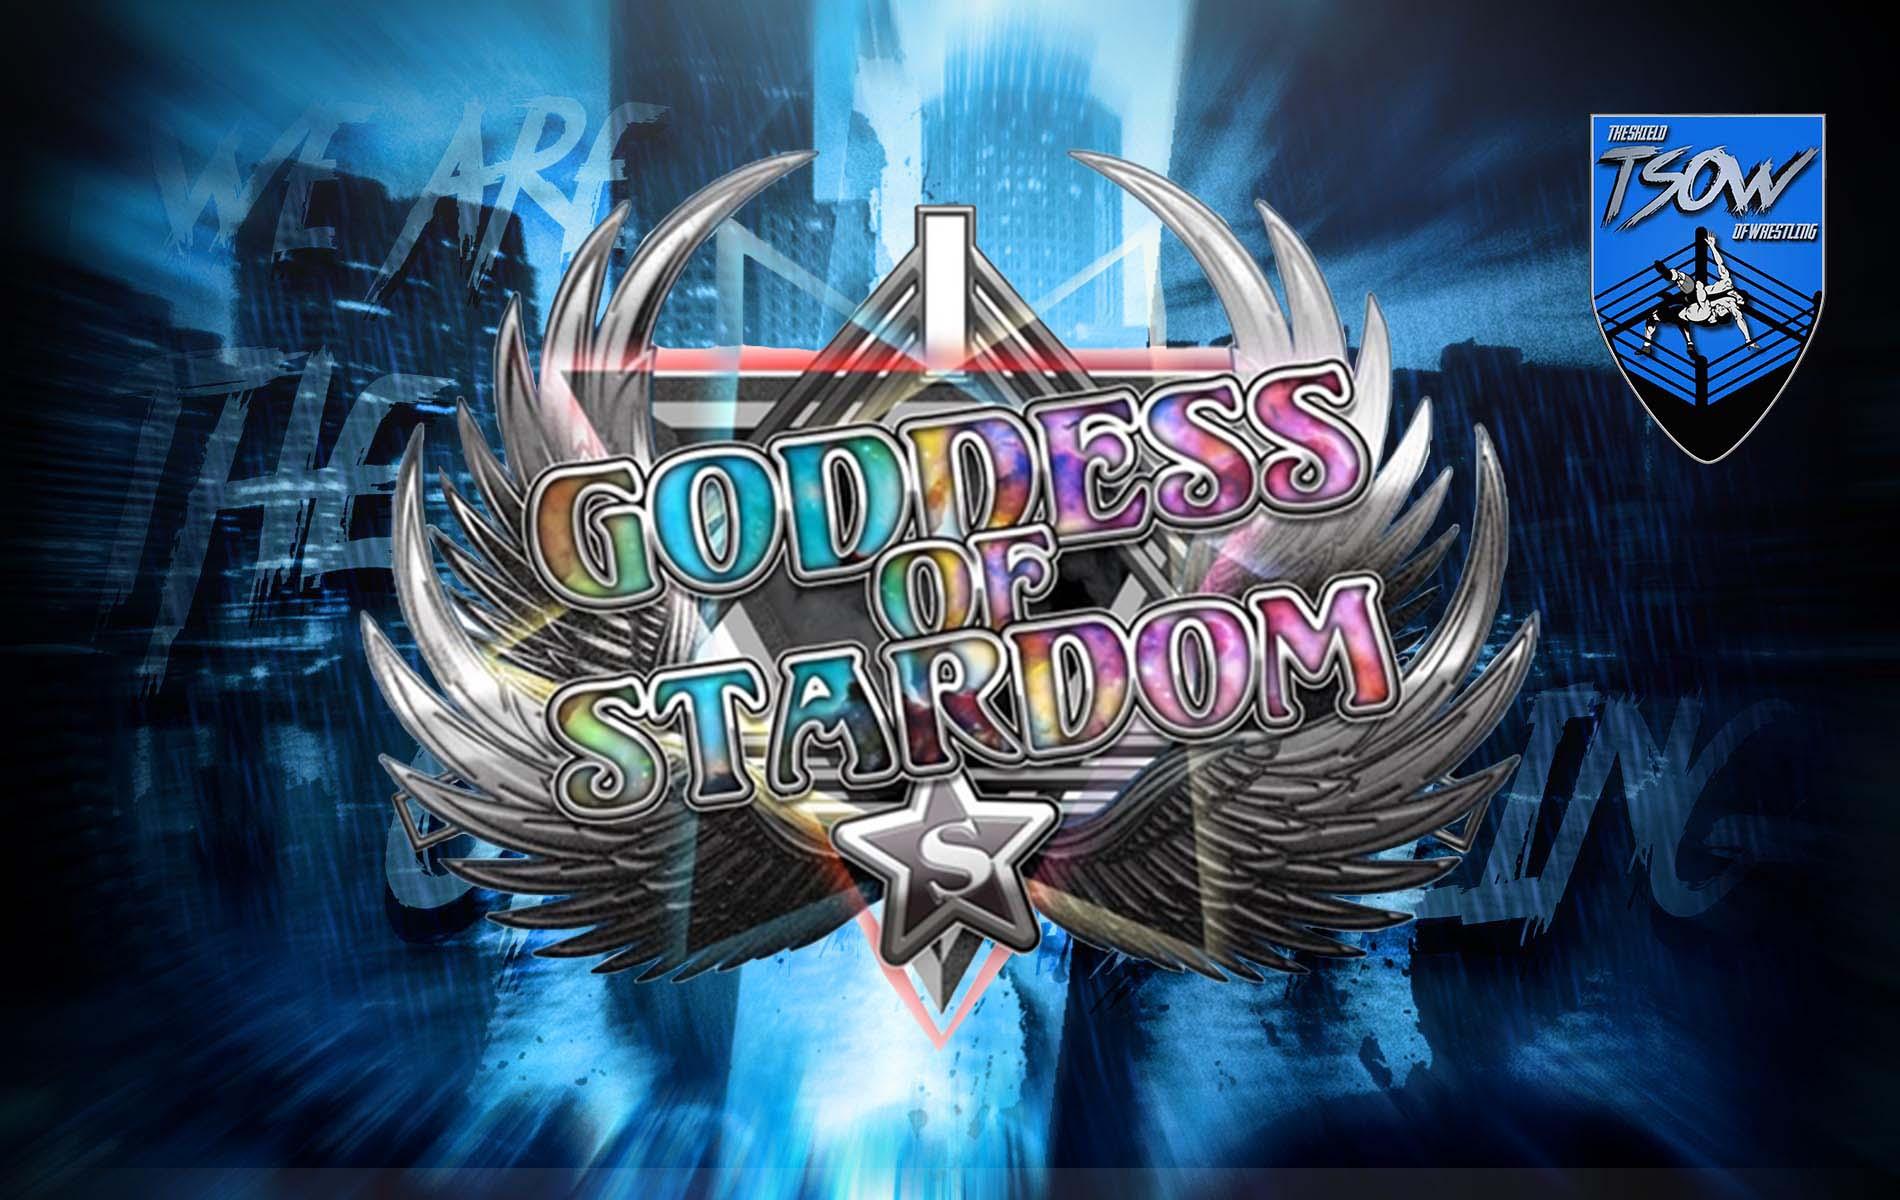 STARDOM Goddess of Stardom Tag League 2020 Risultati – Day 4